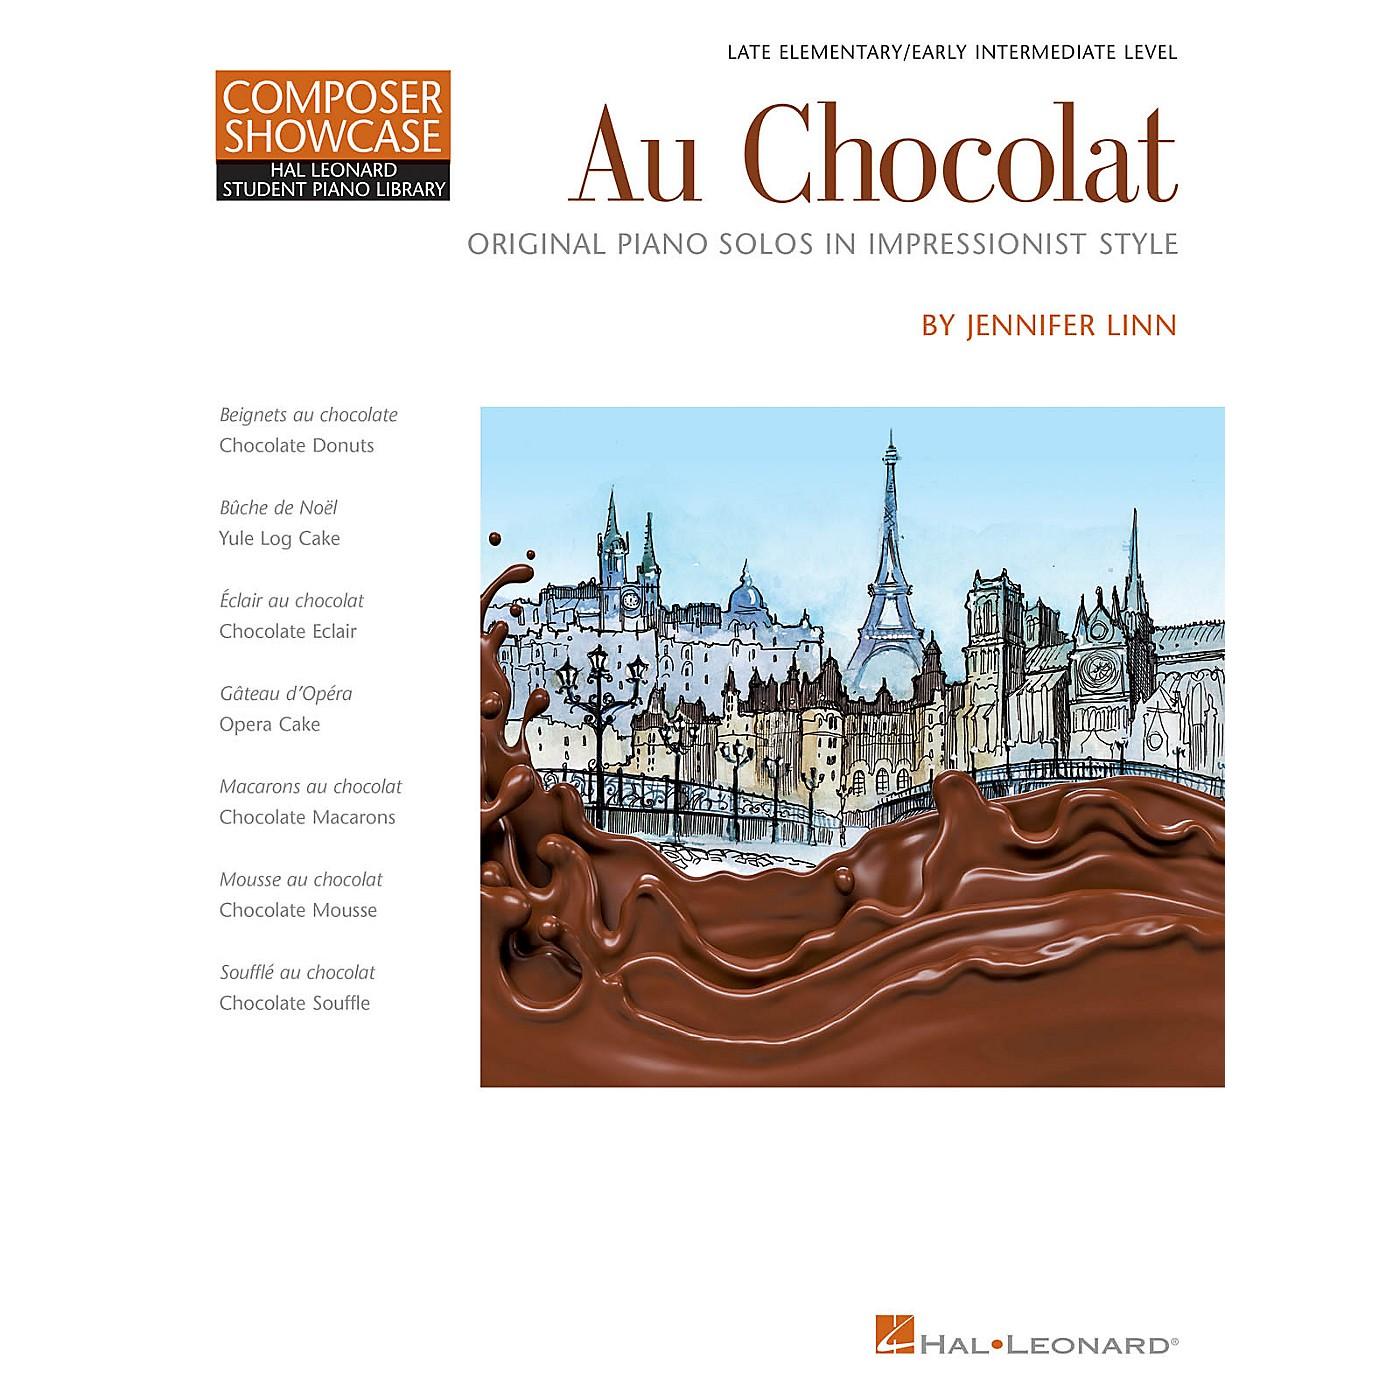 Hal Leonard Au Chocolat-Original Piano Solos in Impressionist Style Late Elementary/Early Intermediate Level thumbnail